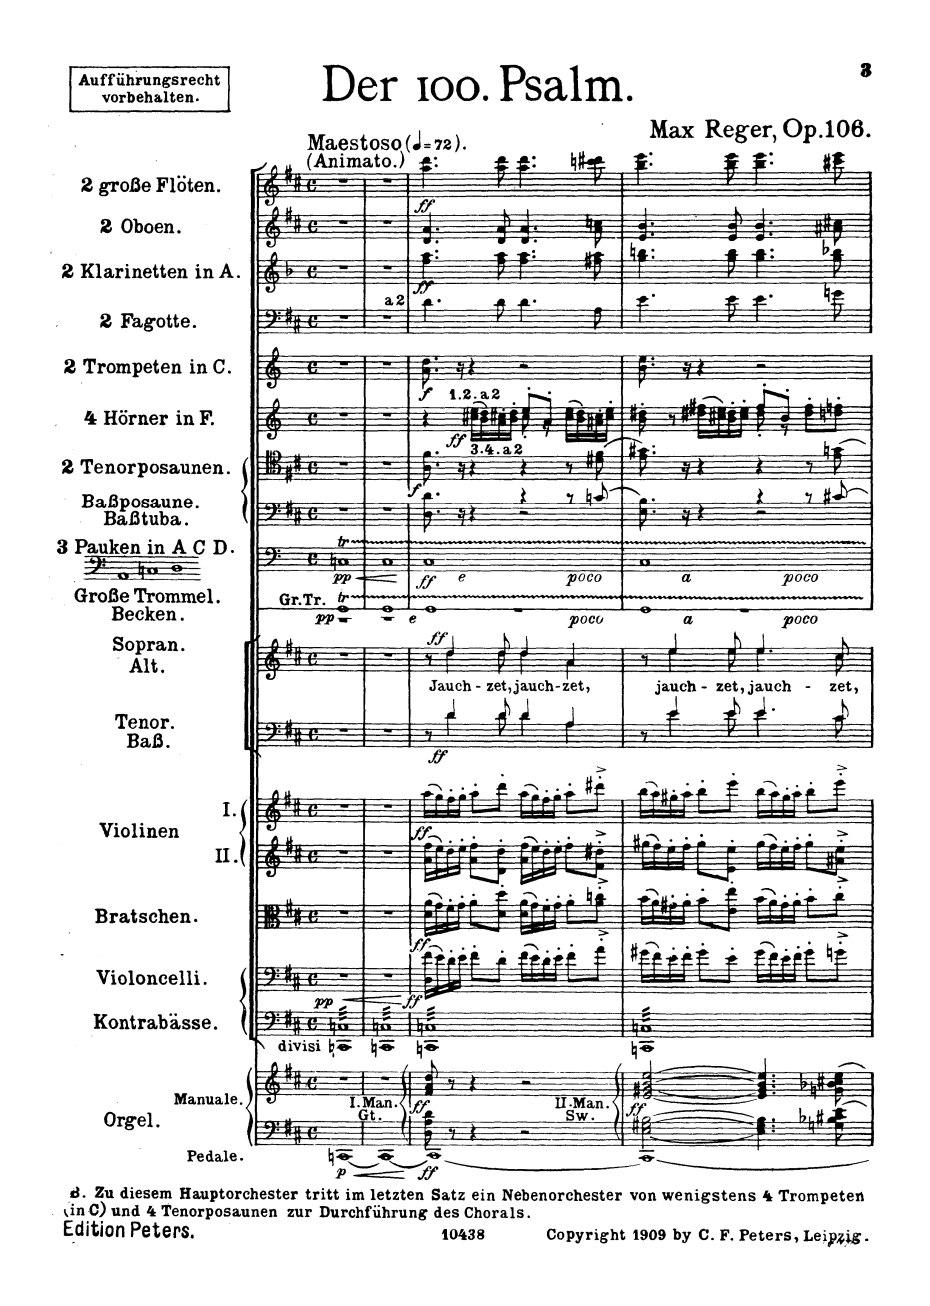 Der 100. Psalm Max Reger